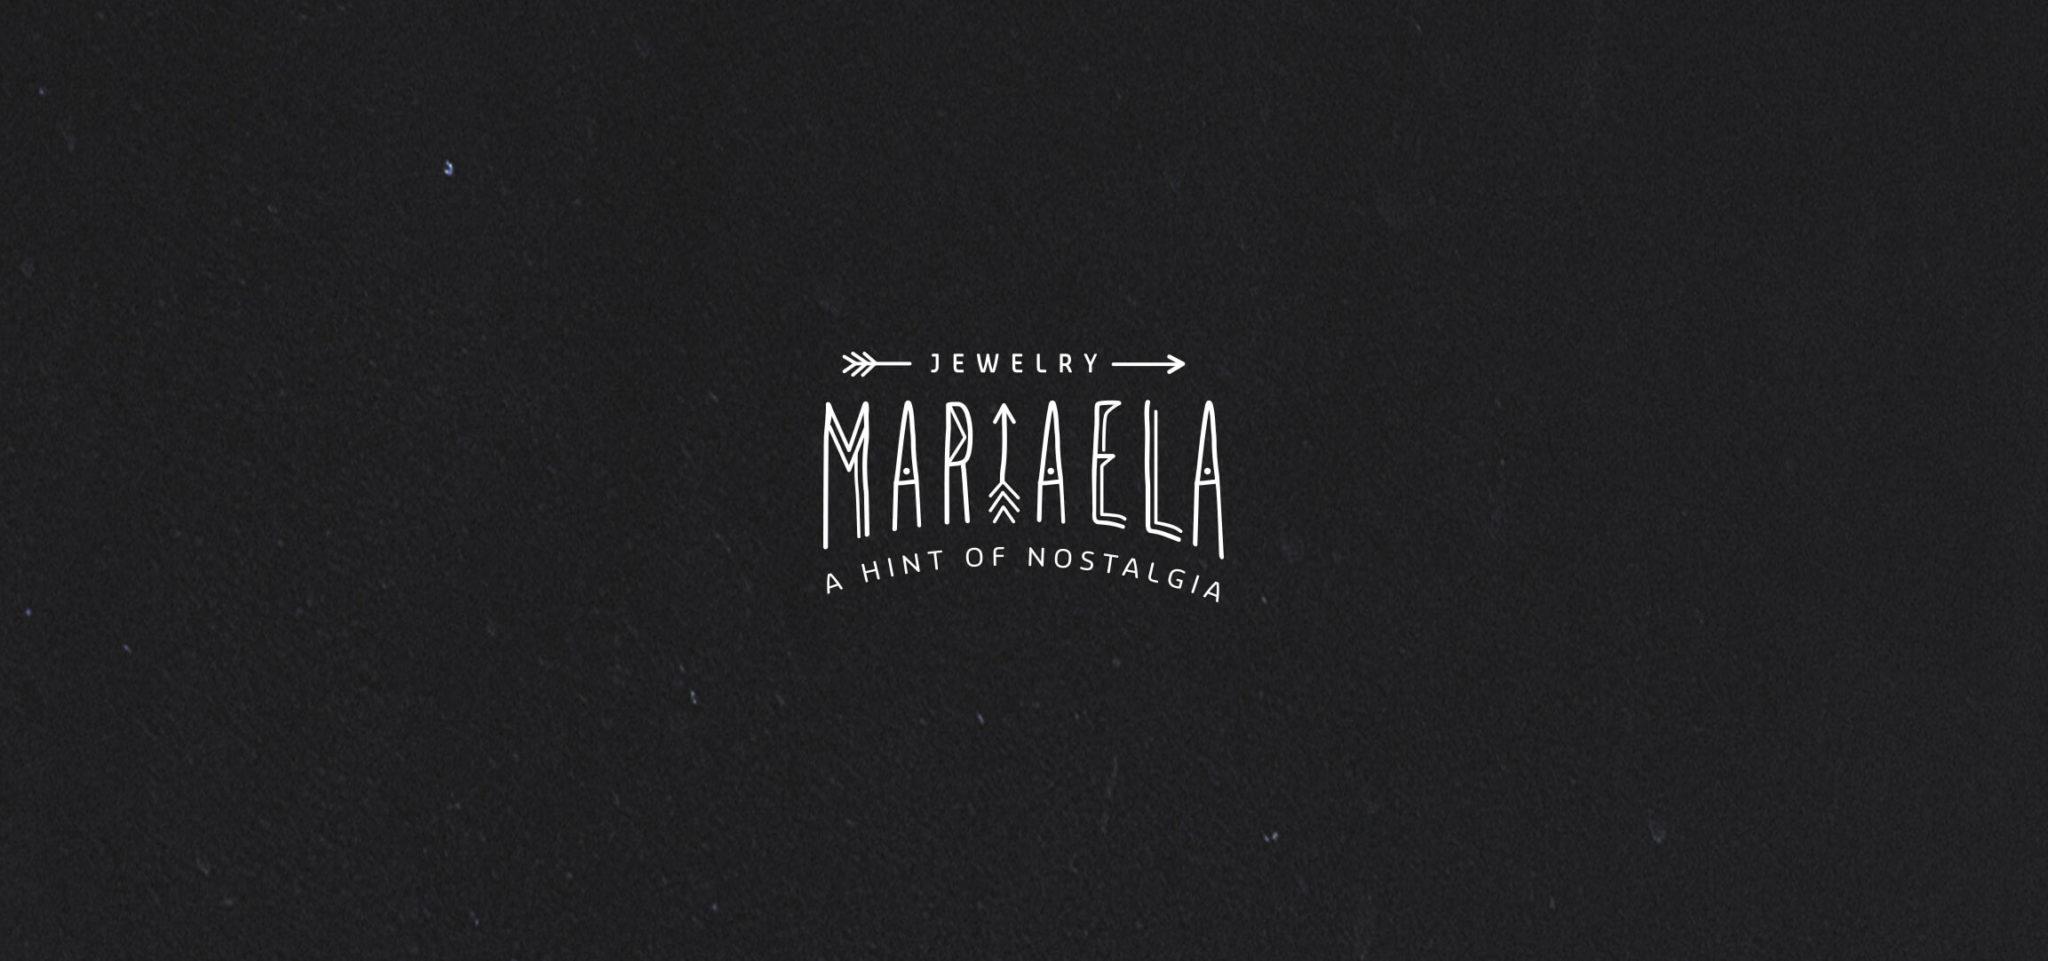 Mariaela_logo-boho-jewelry-1